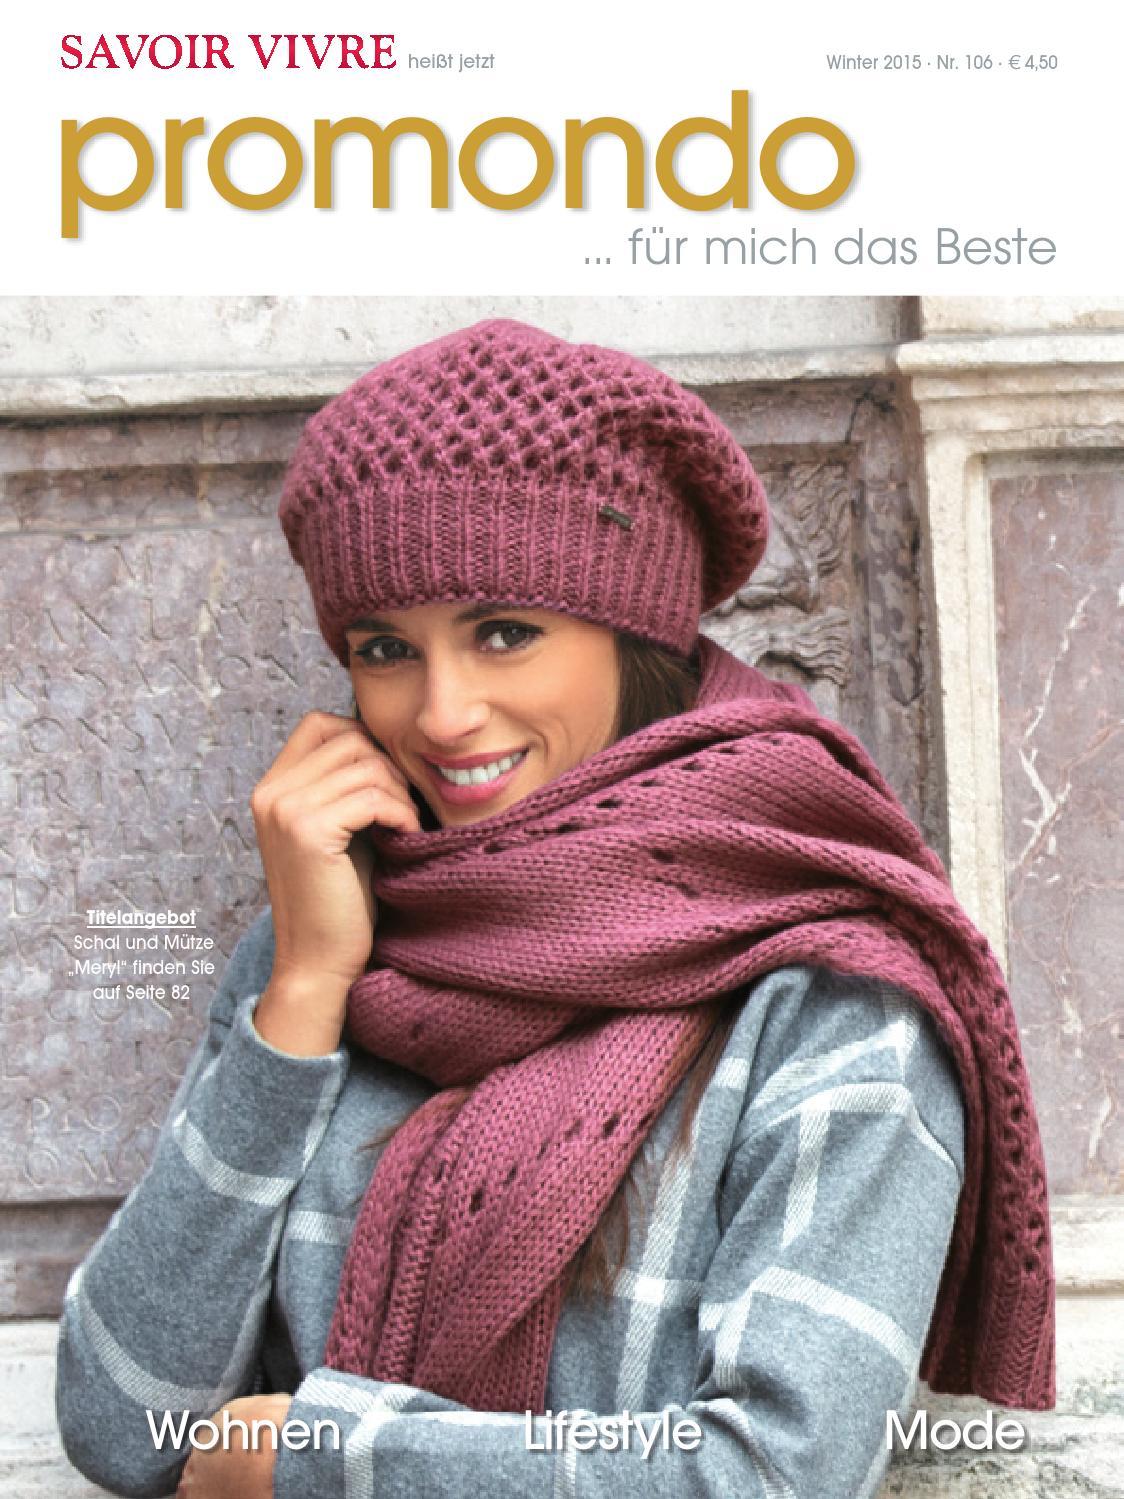 Promondo2 by katalog de.ru заказ одежды по каталогам